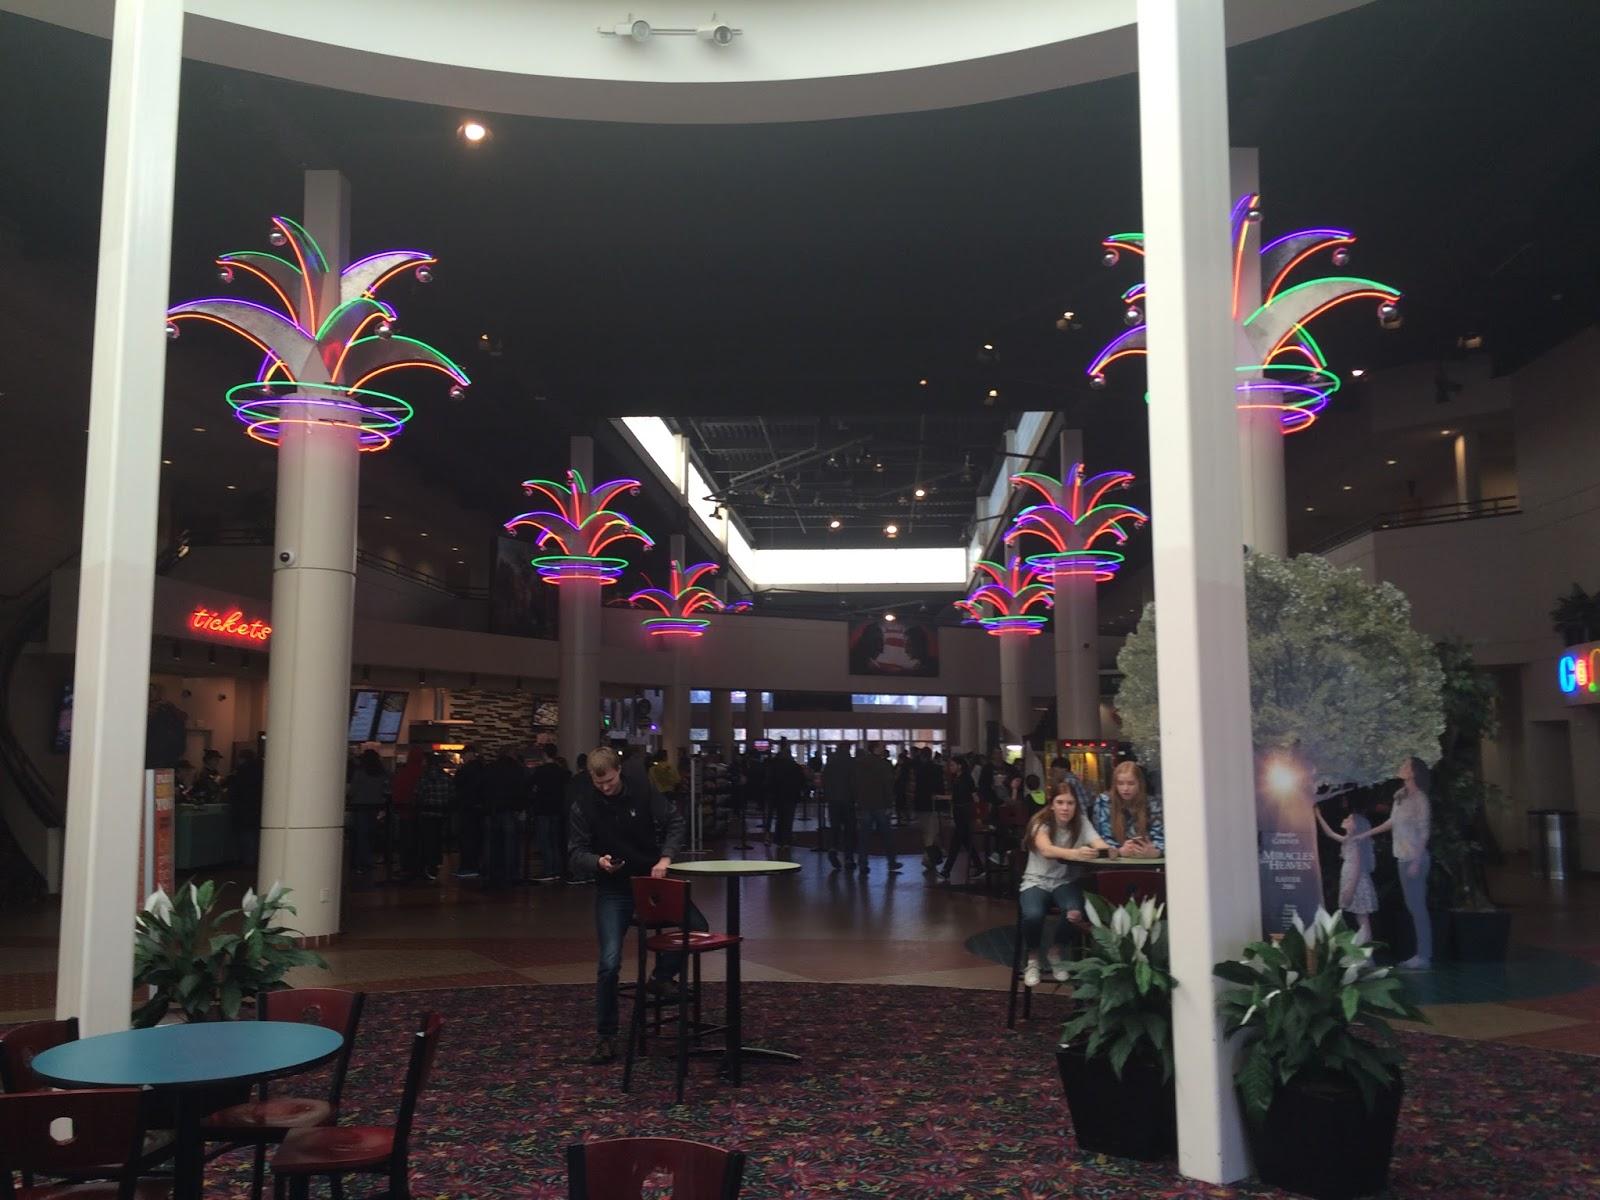 Celebration cinema movie theater in michigan